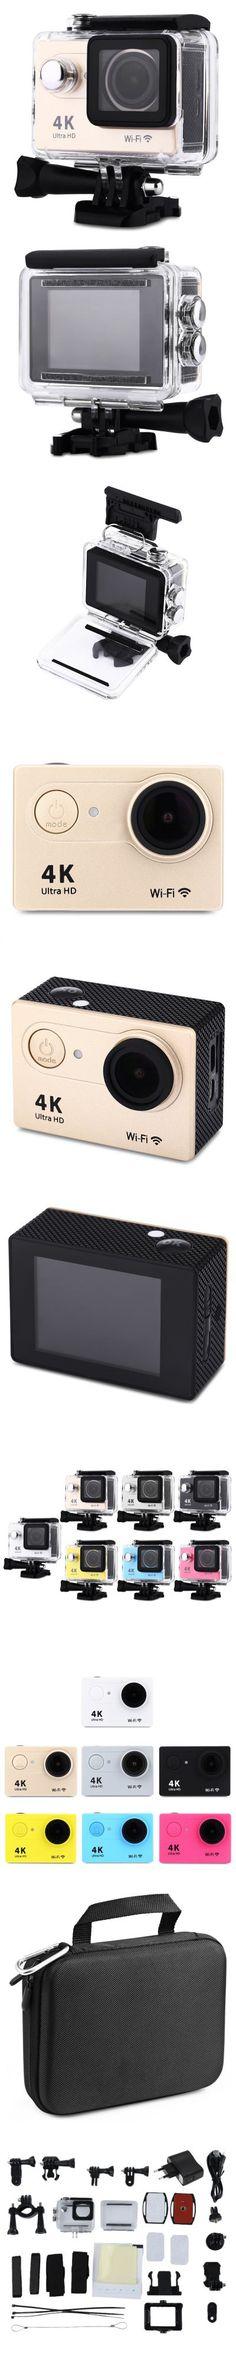 H9 30M Waterproof 1080P Action Sport Camera EU PLUG-49.85